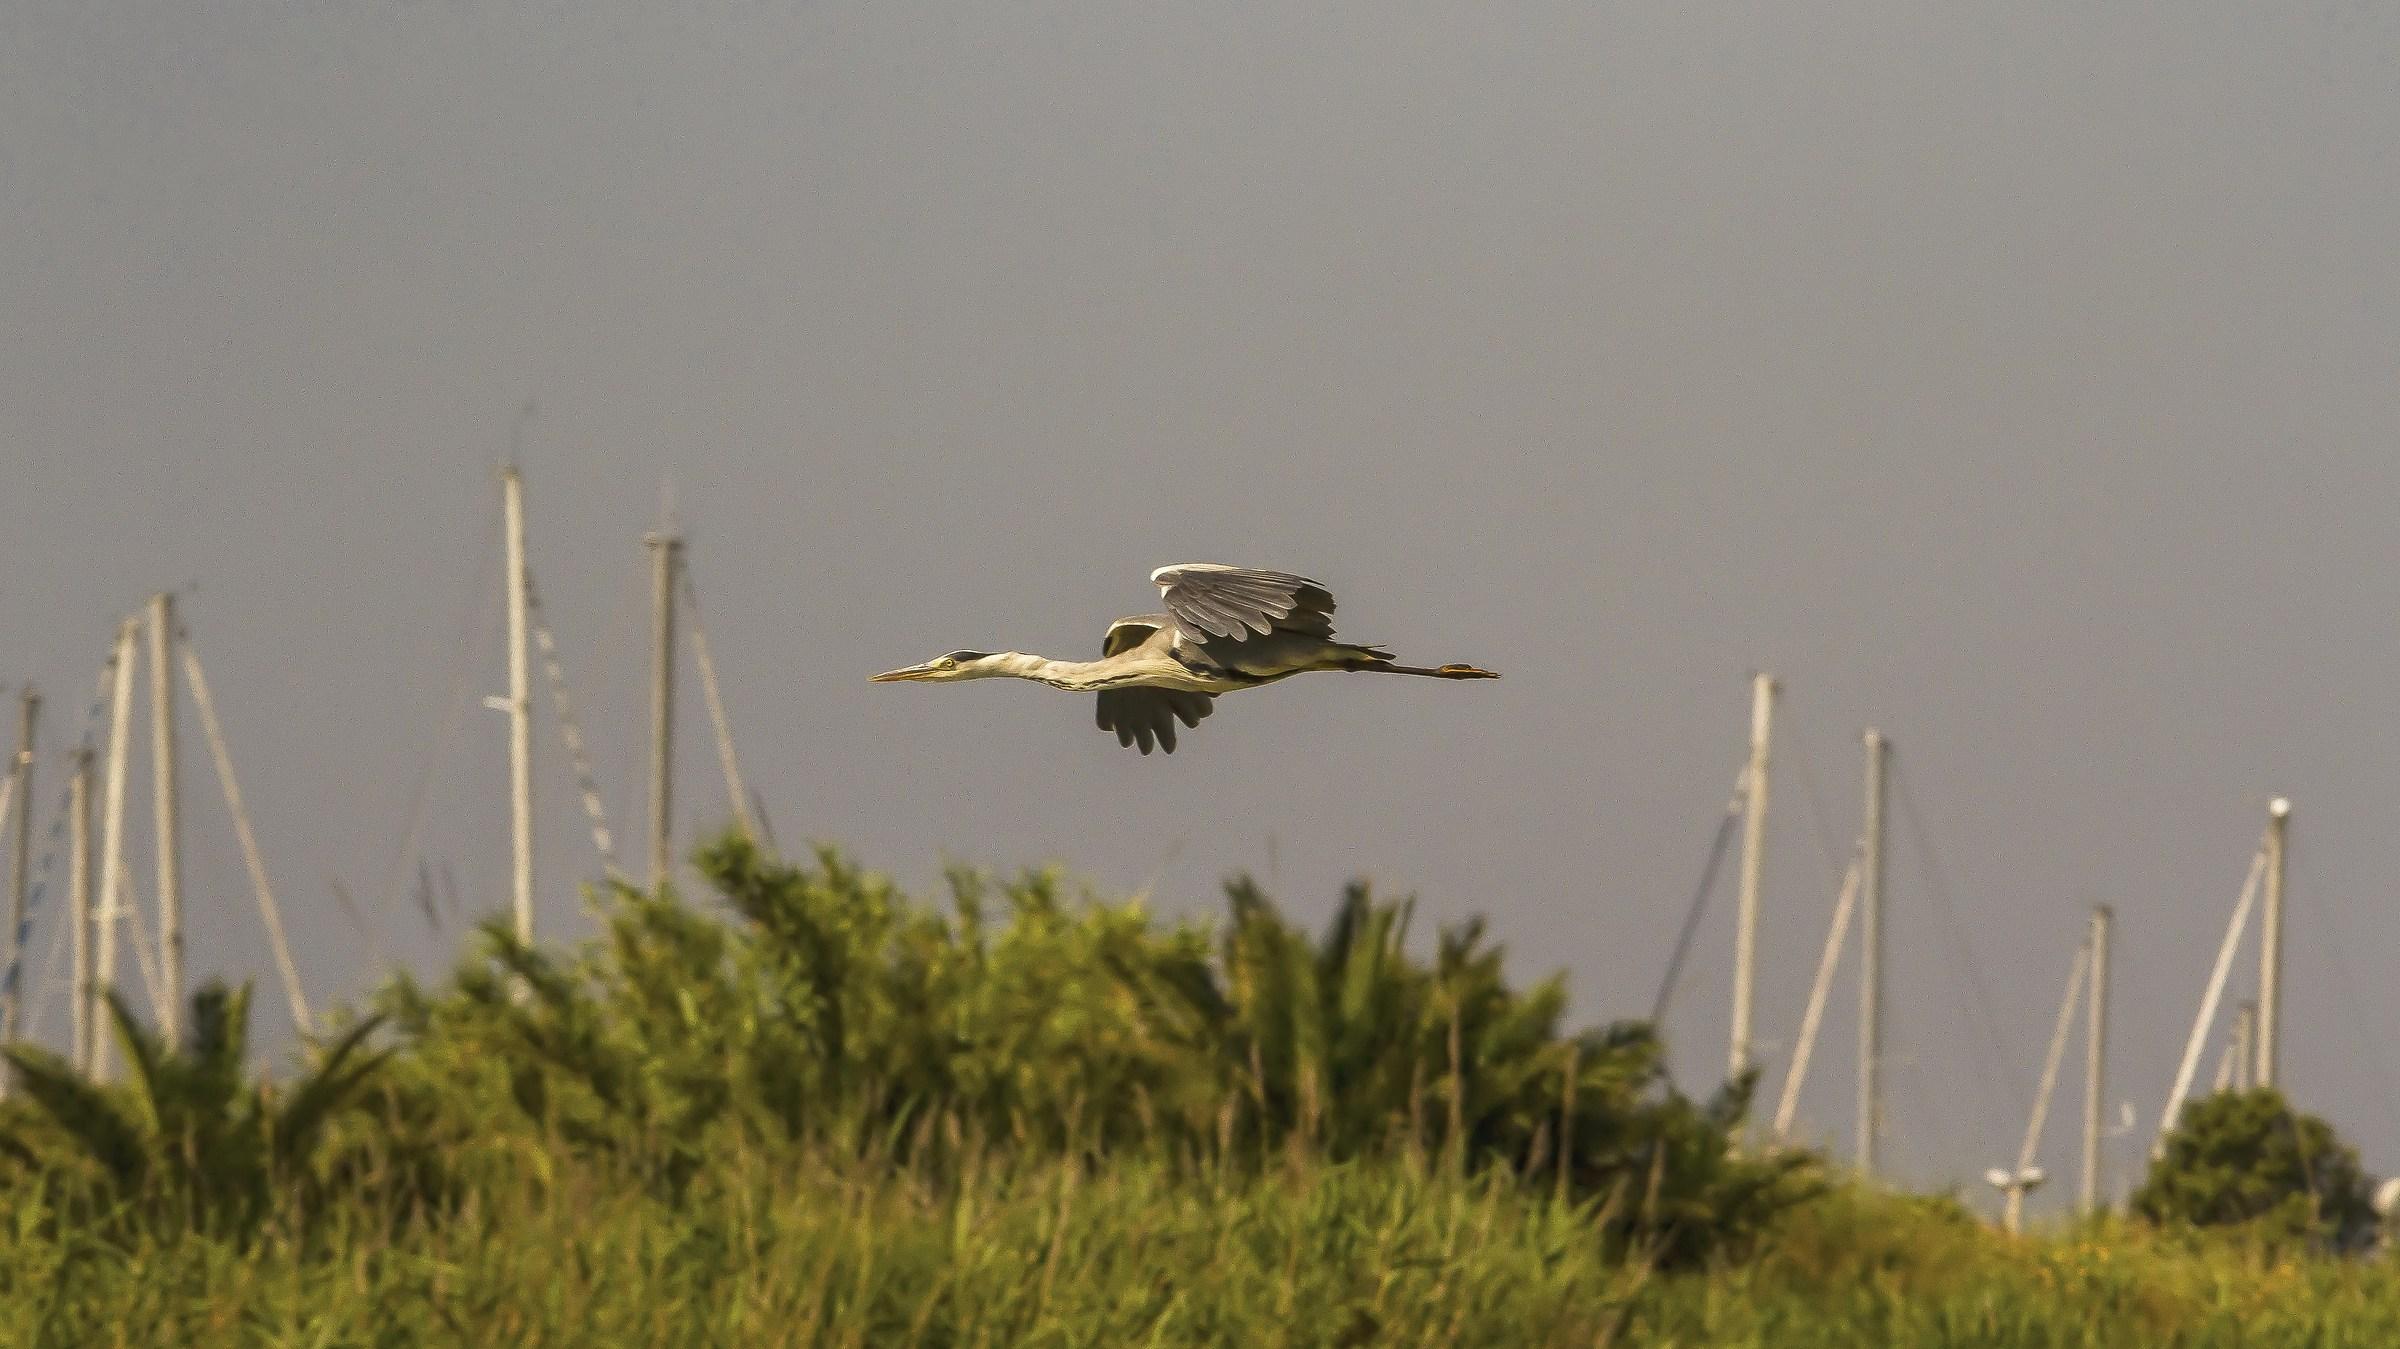 The Flight of the Heron Grey...